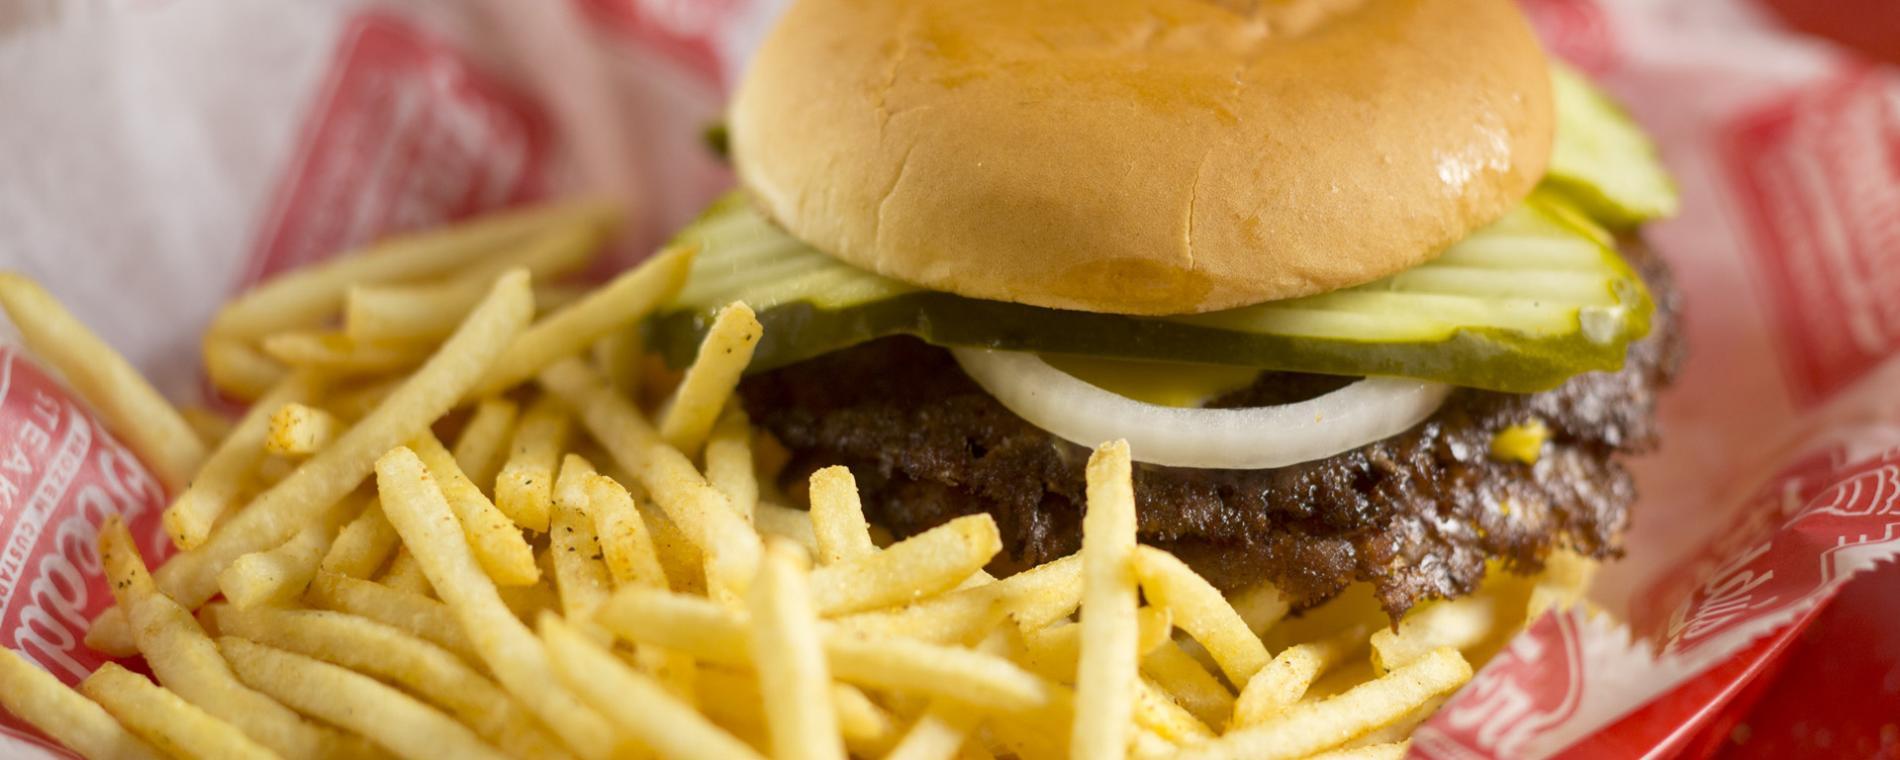 Freddy's Burger & Fries